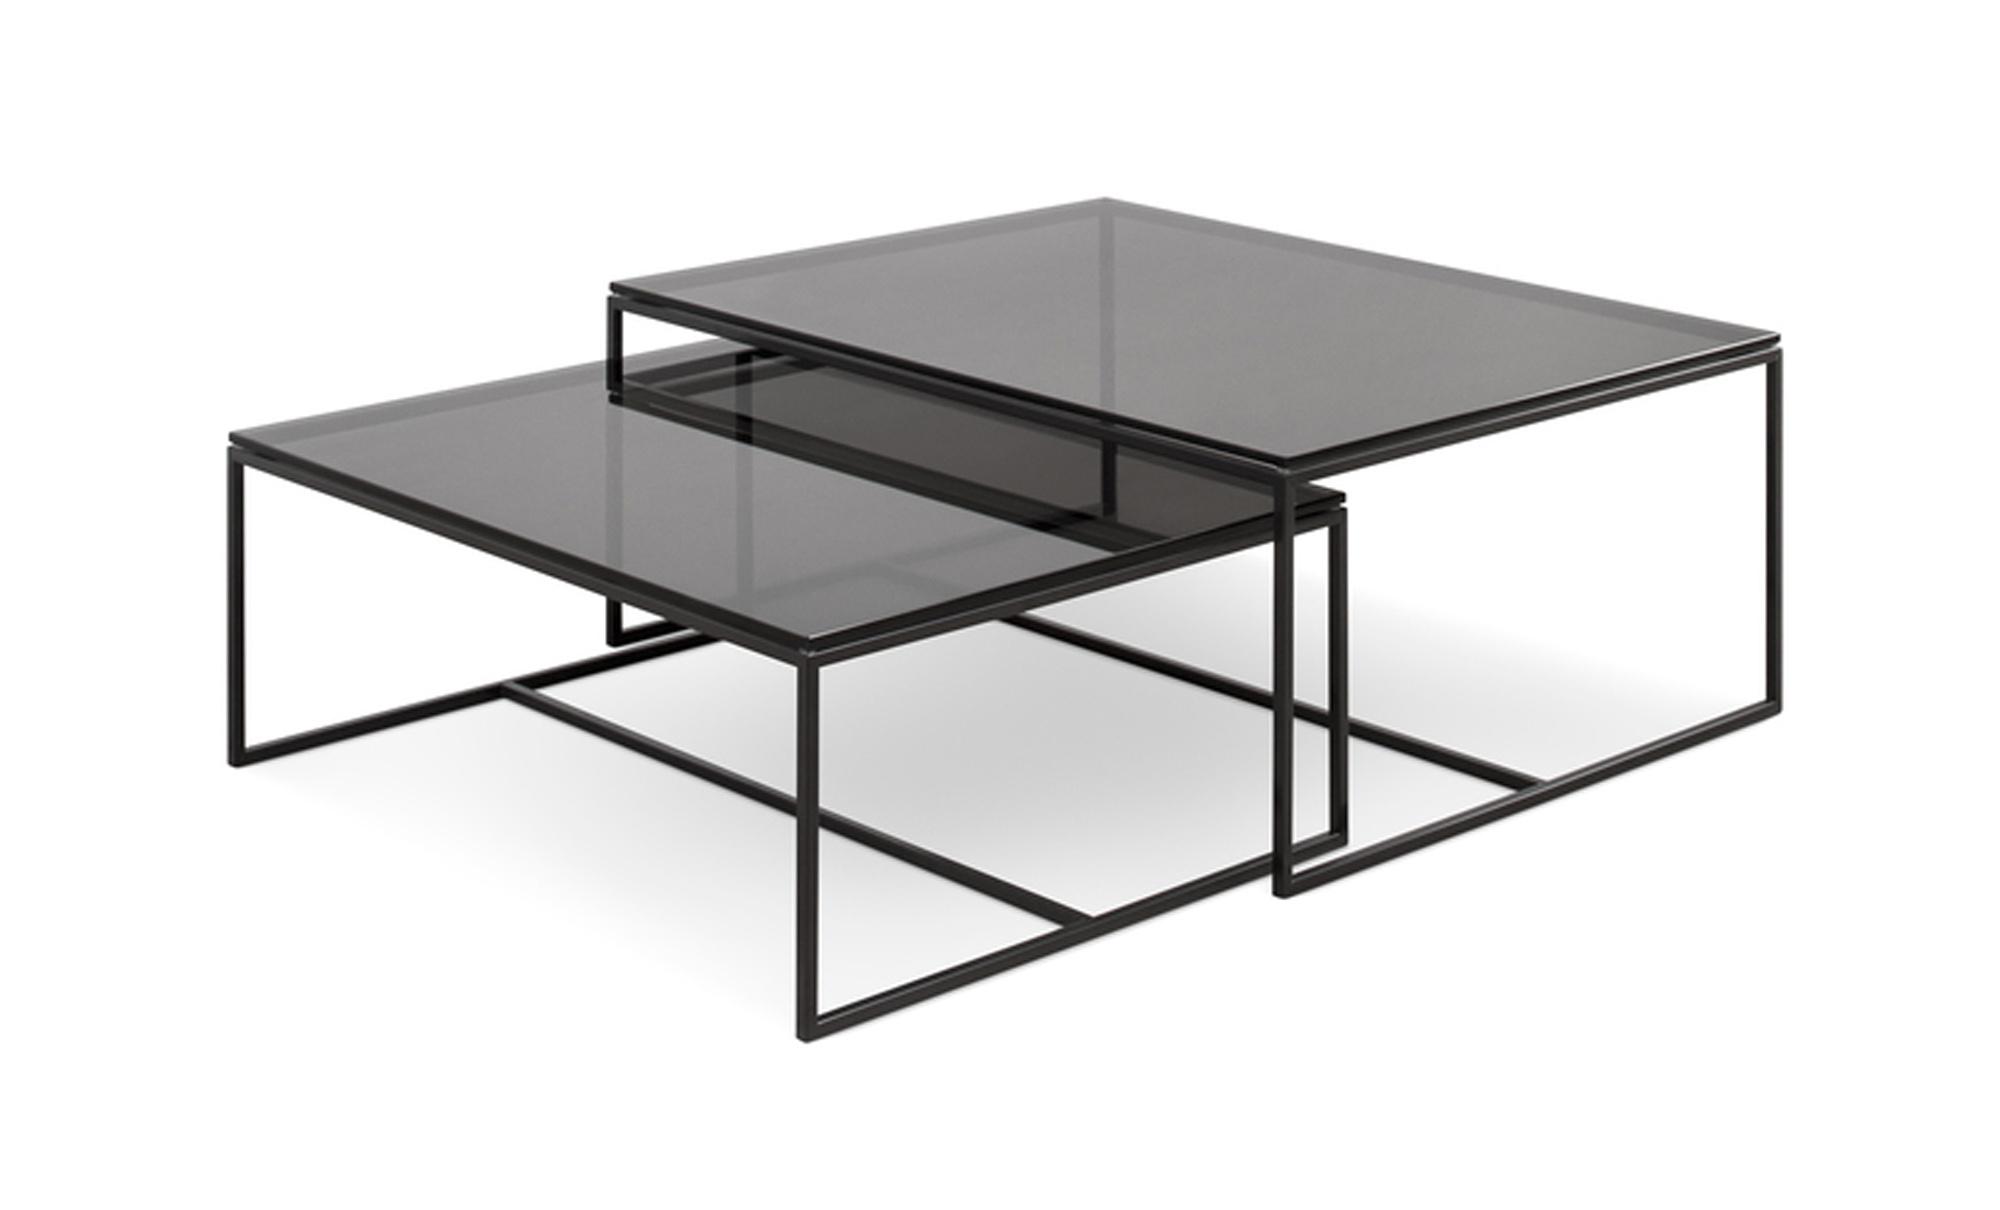 Designer Coffee Tables Sydney \u0026 Melbourne - Fanuli Furniture